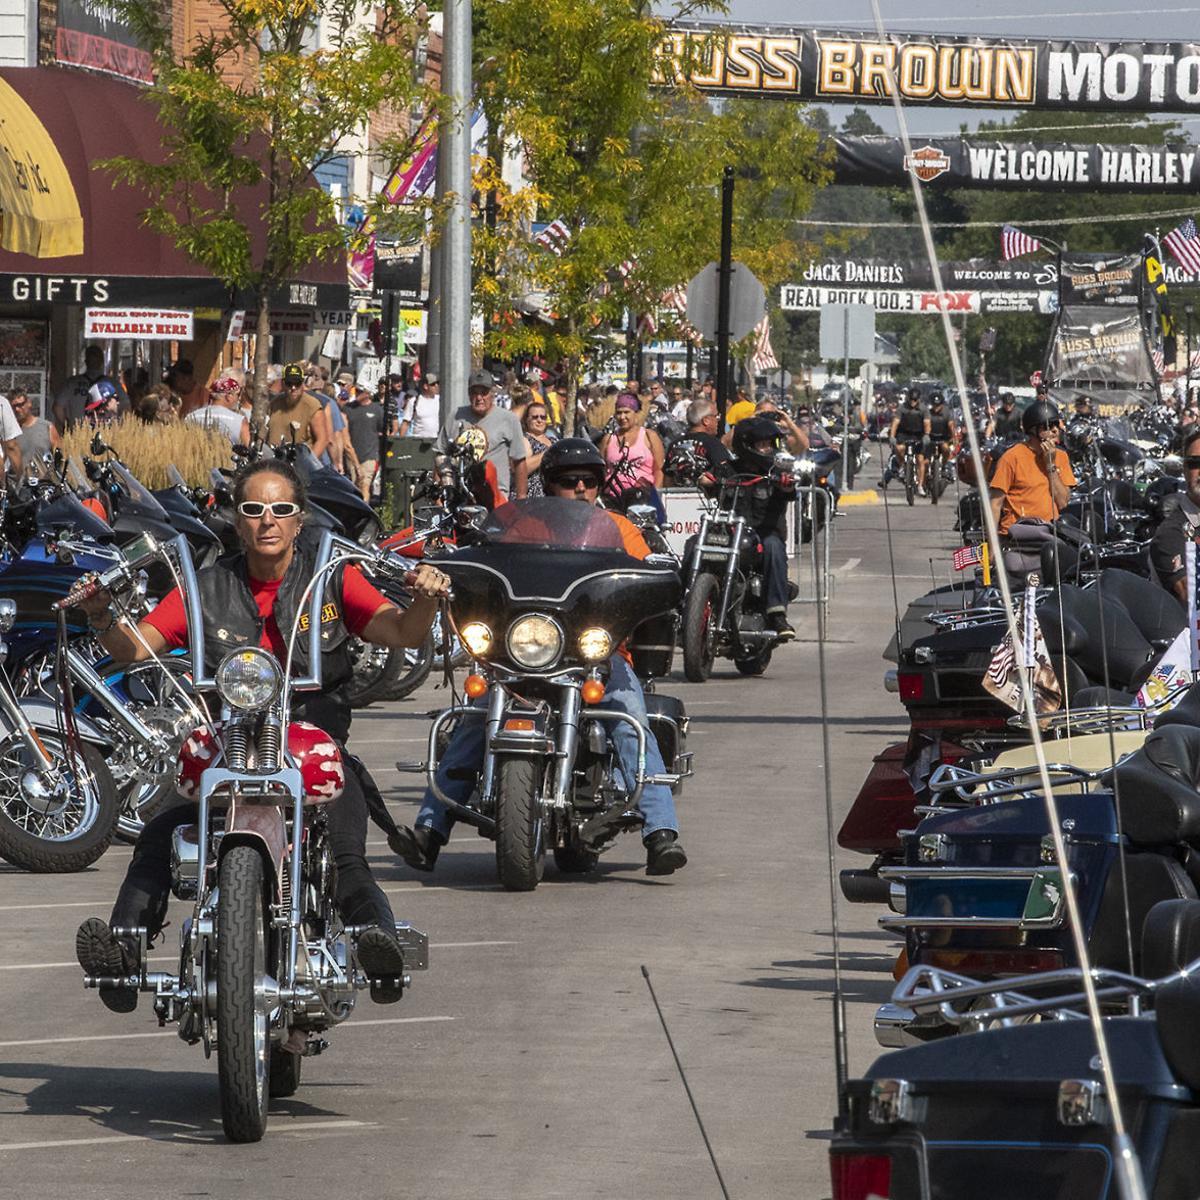 Nebraska Motorcycle Events 2020.2020 Sturgis Rally Schedule Has Some Bikers Scrambling